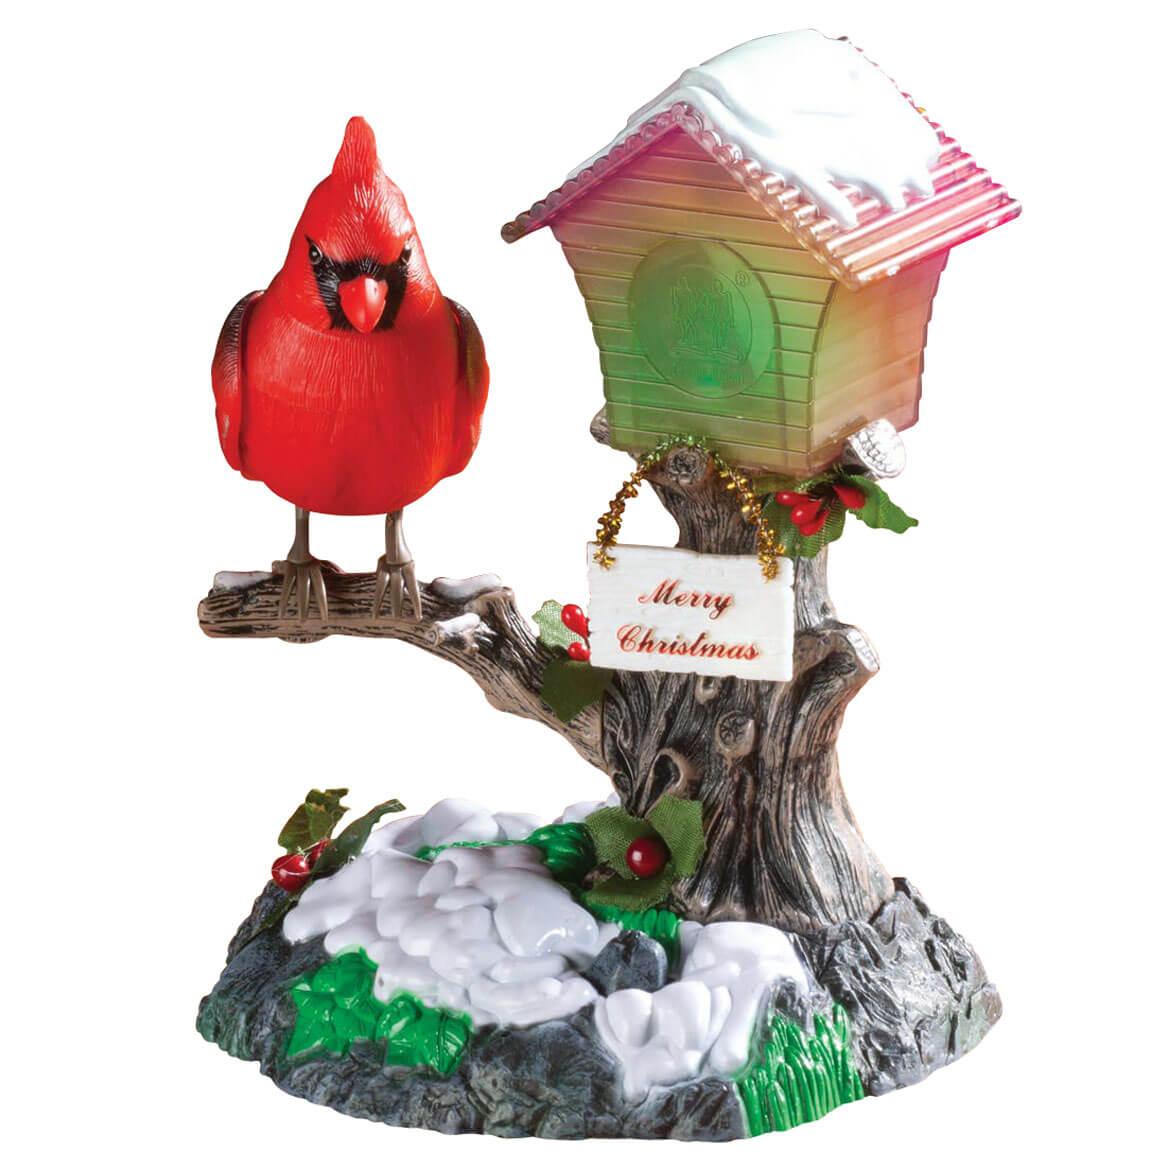 Archivo: Cardinal-singing.jpg - Wikipedia, la enciclopedia libre